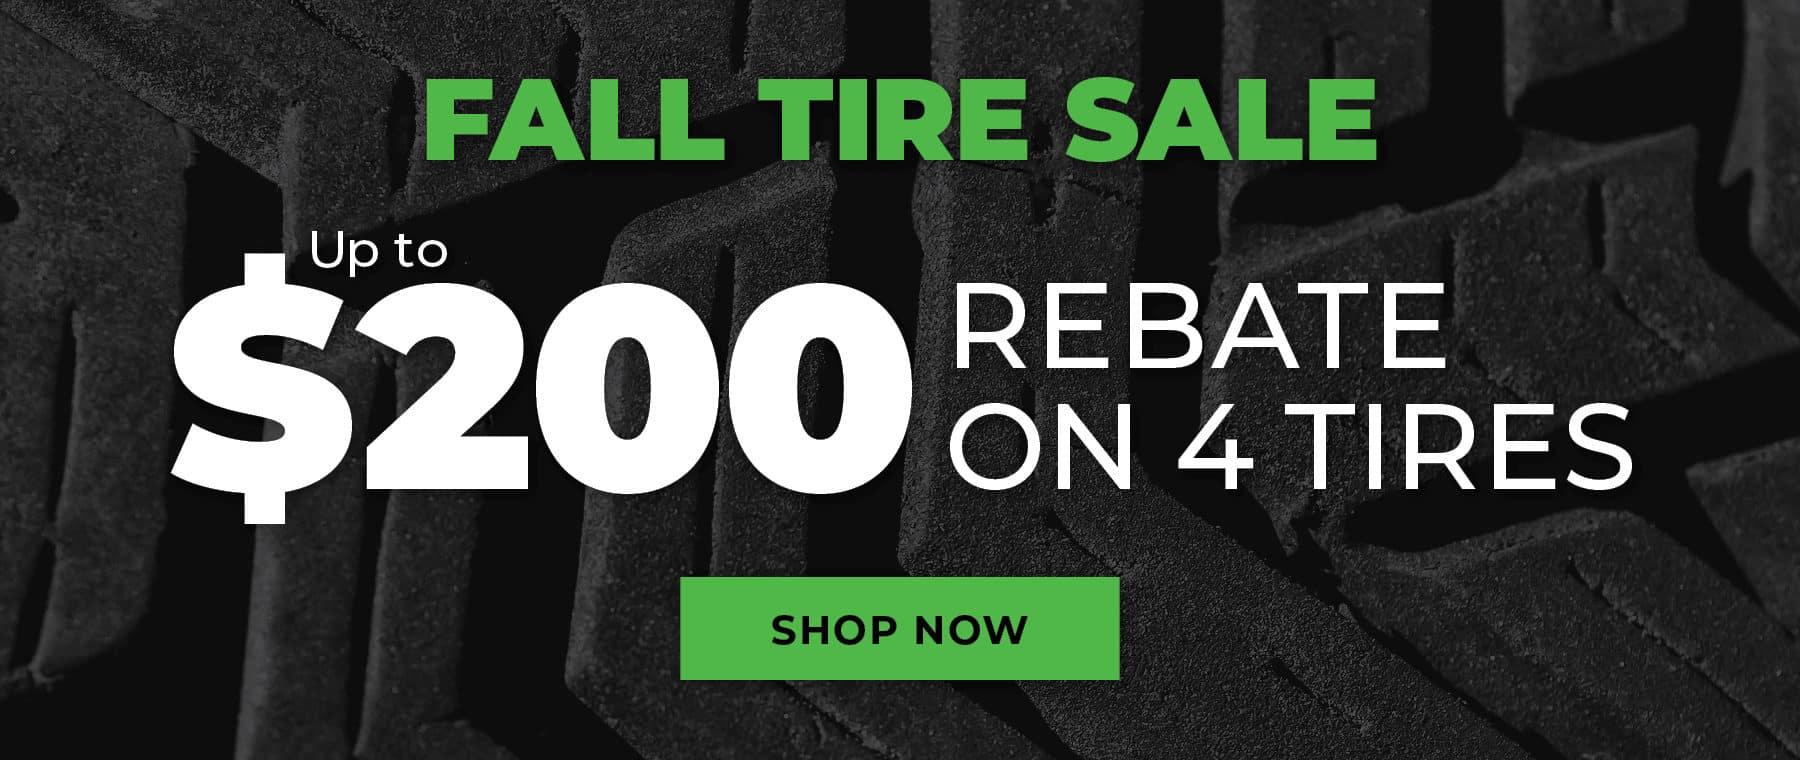 Fall Tire Sale